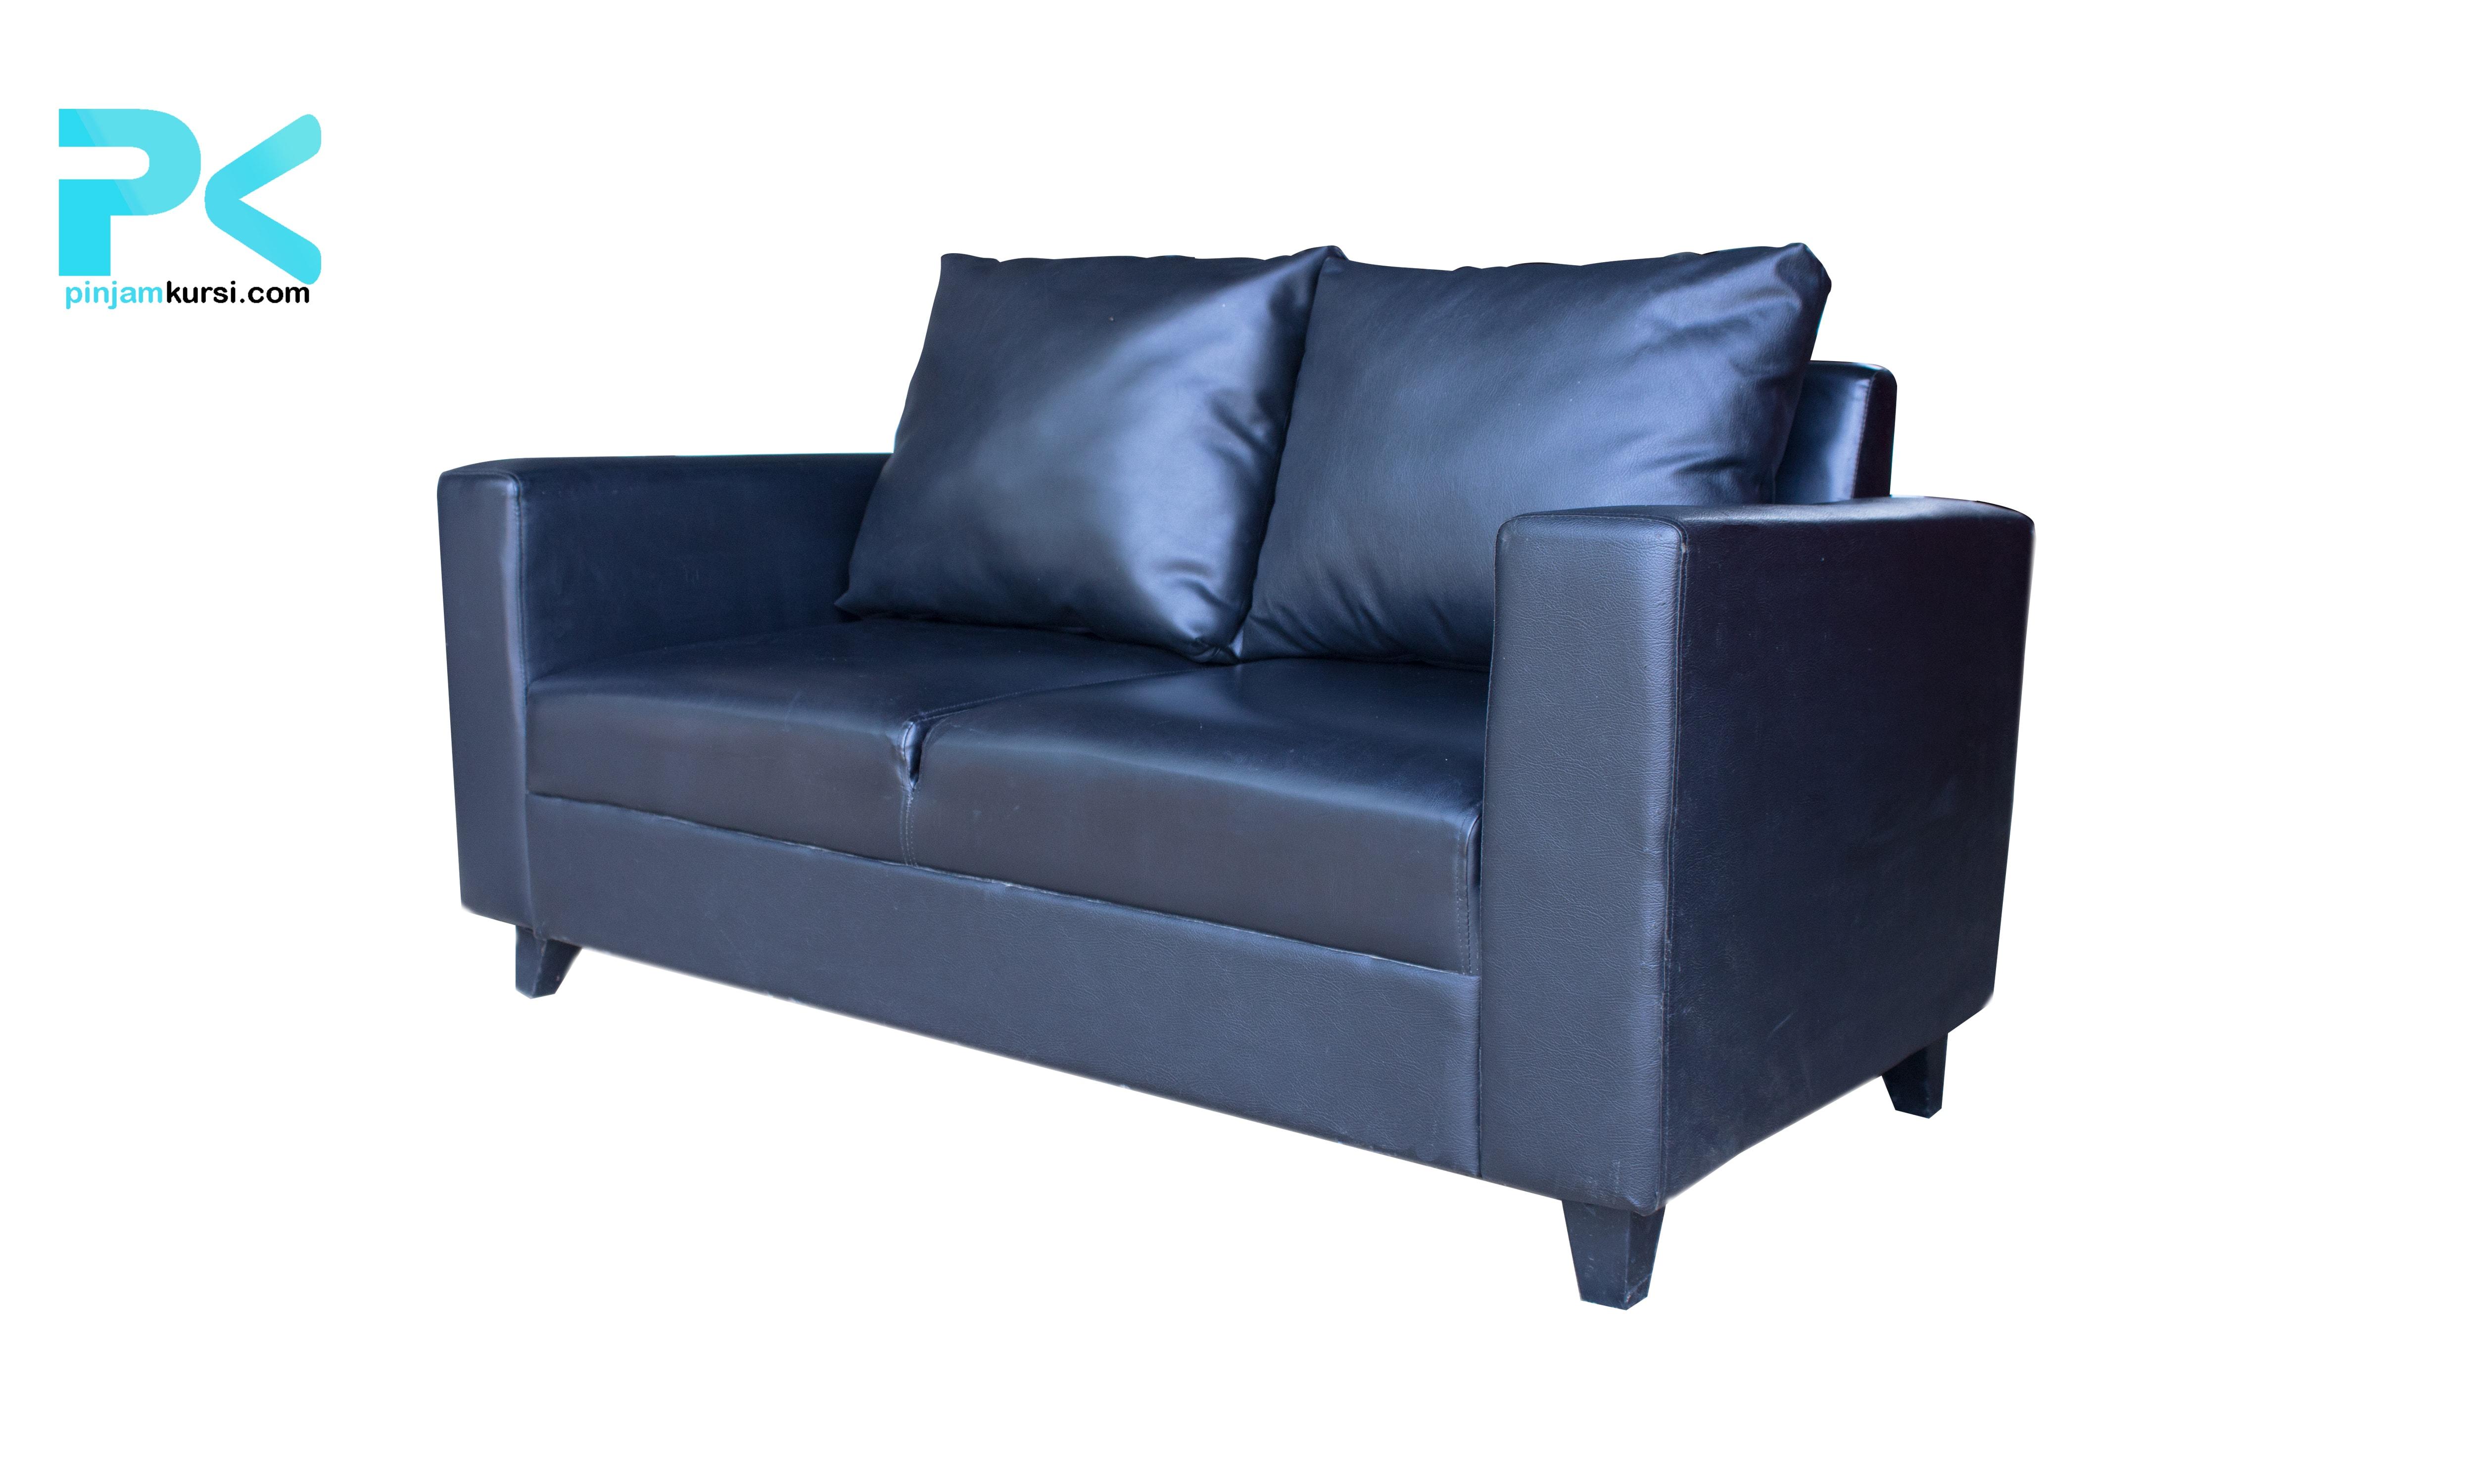 sewa sofa vip dua seat warna hitam